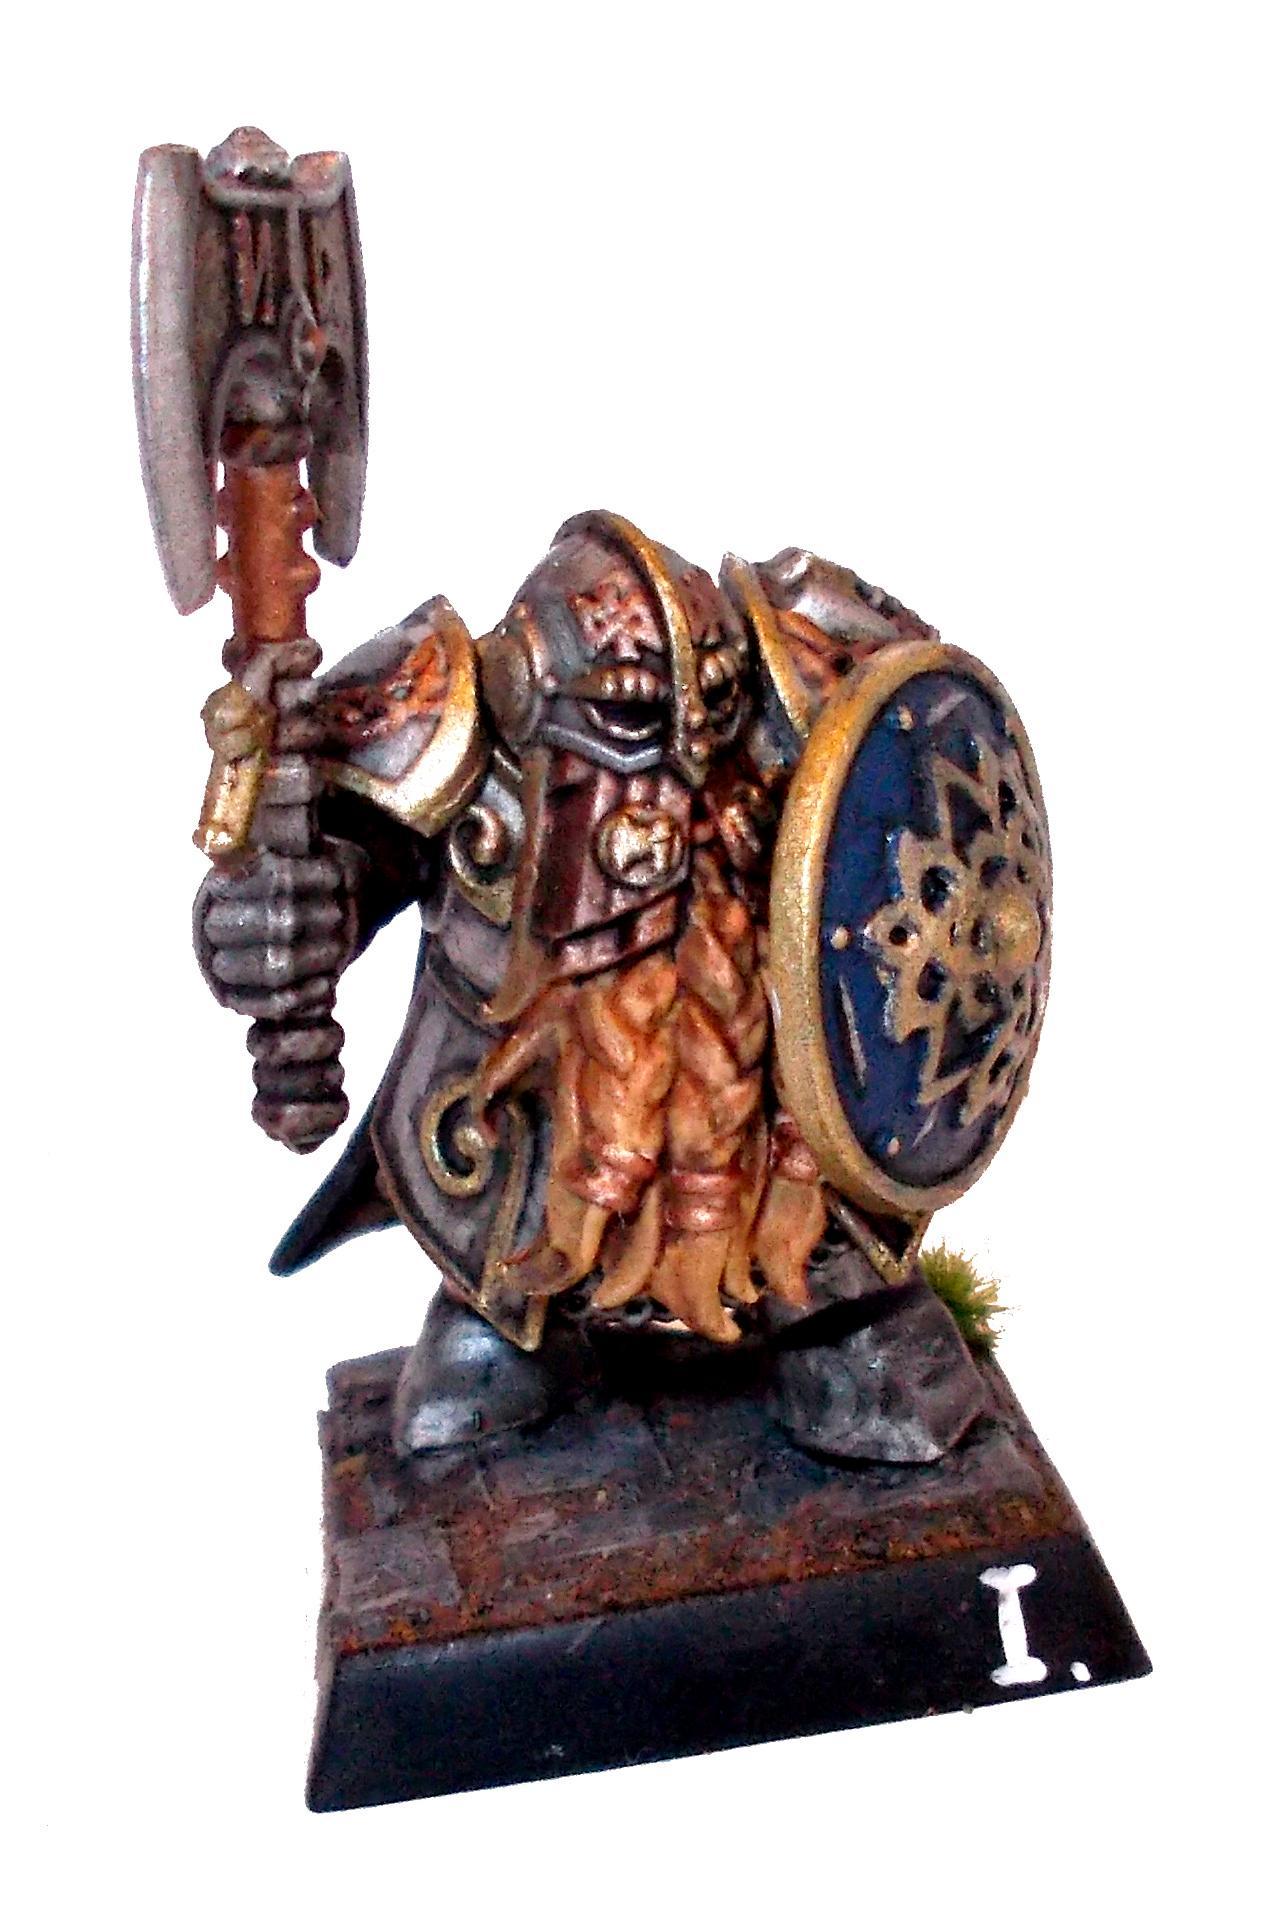 Dwarves, Mordheim, Thorgrim Ironfist